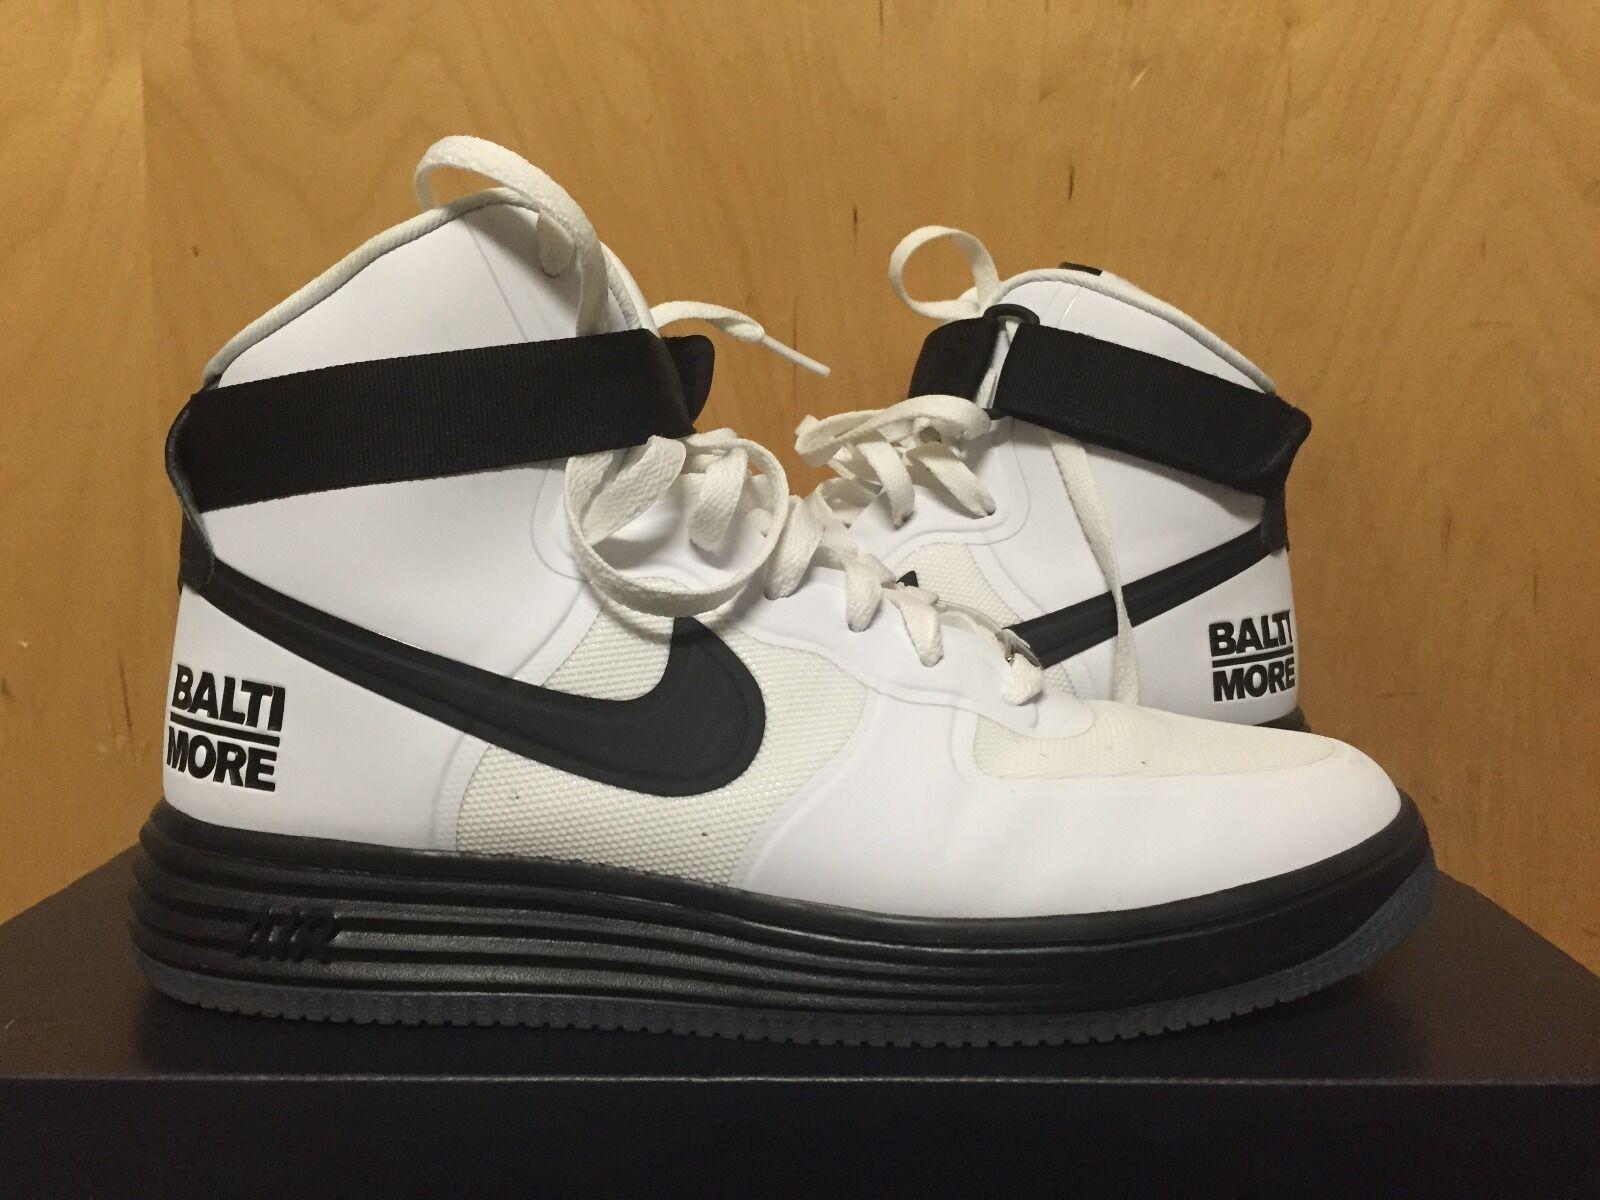 Nike  Lunar Force 1 HYP HI CITY QS (Baltimore) Size 10  617899-100